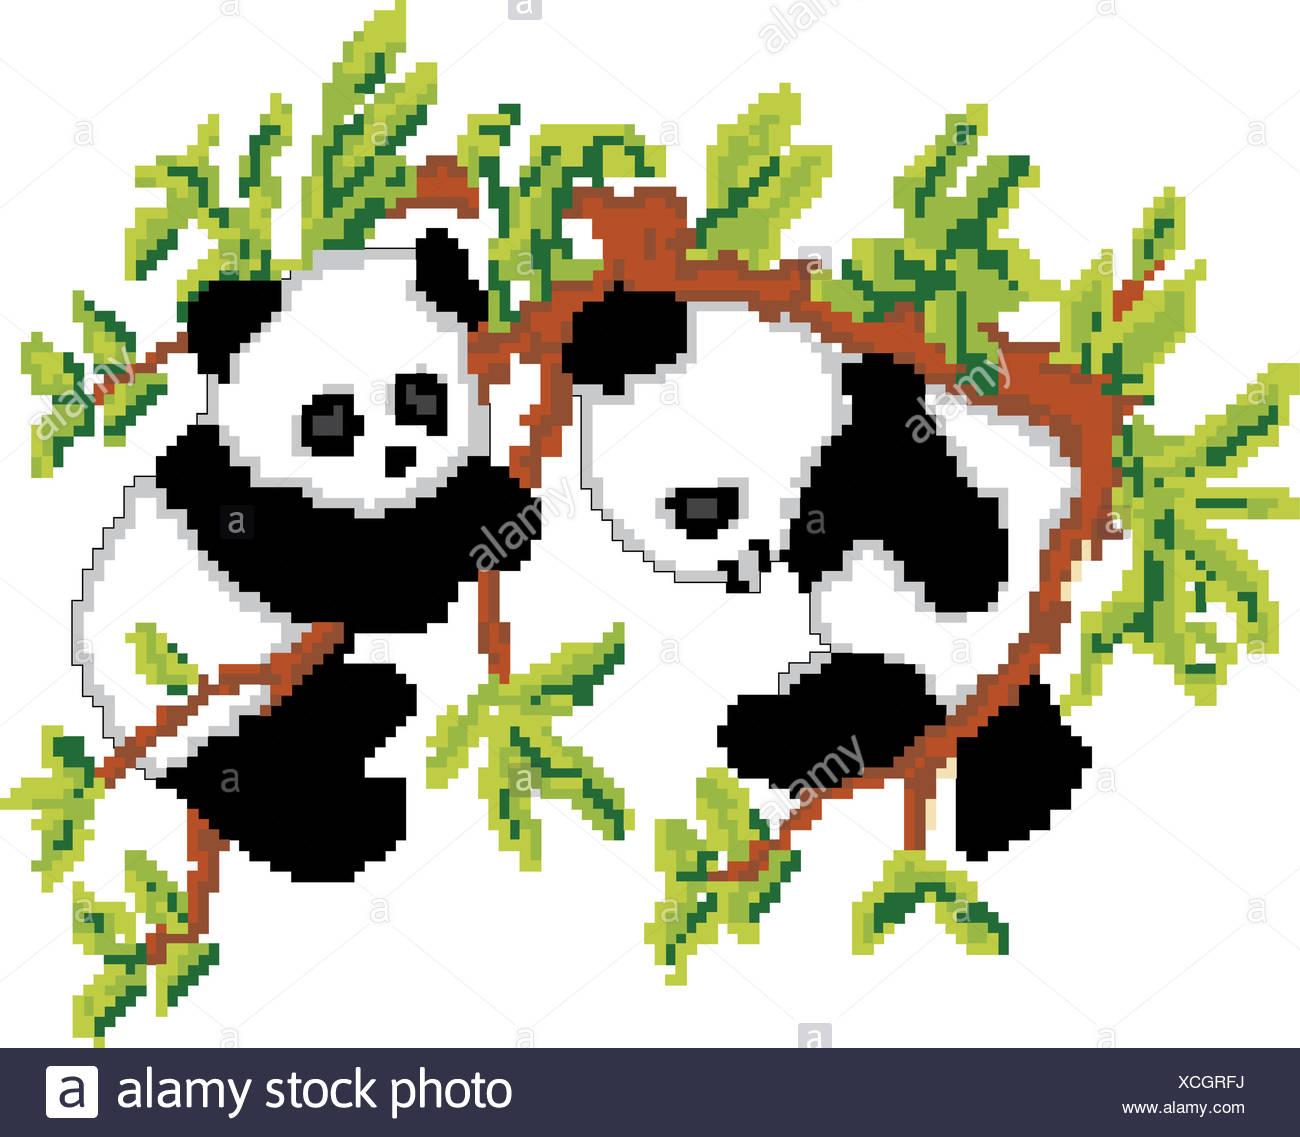 Pandas On Tree Pixel Art Stock Photo 283111462 Alamy